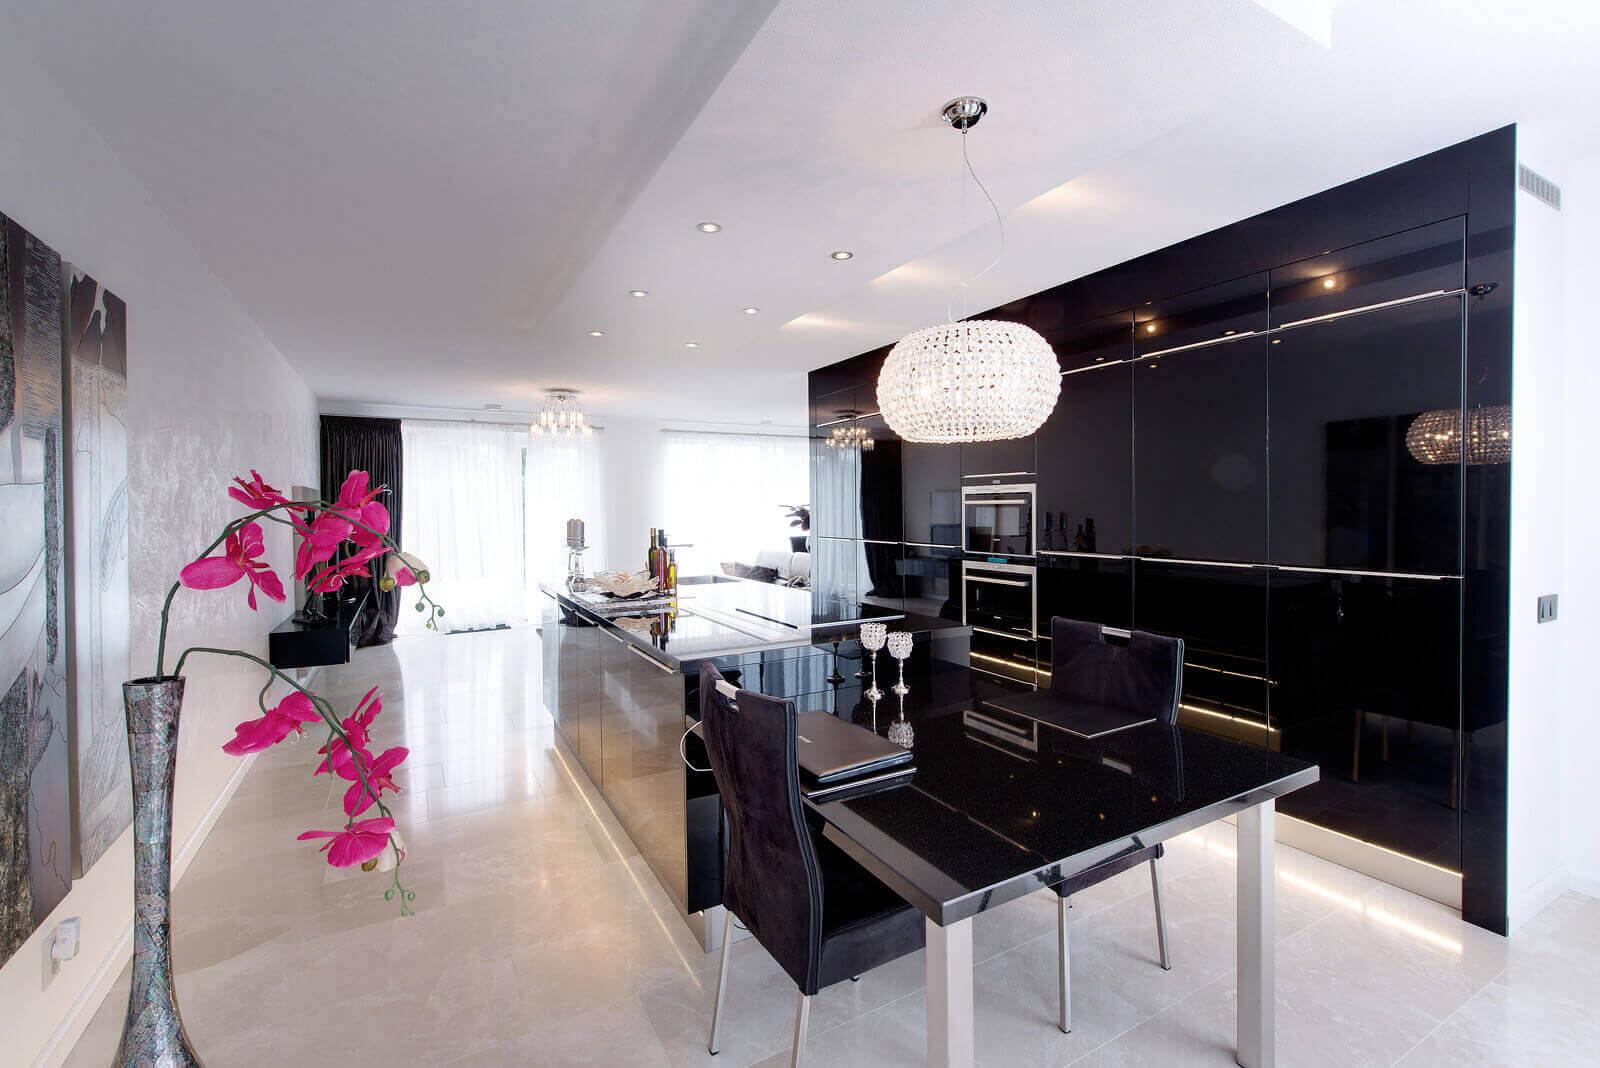 Moderne keukens inspiratie